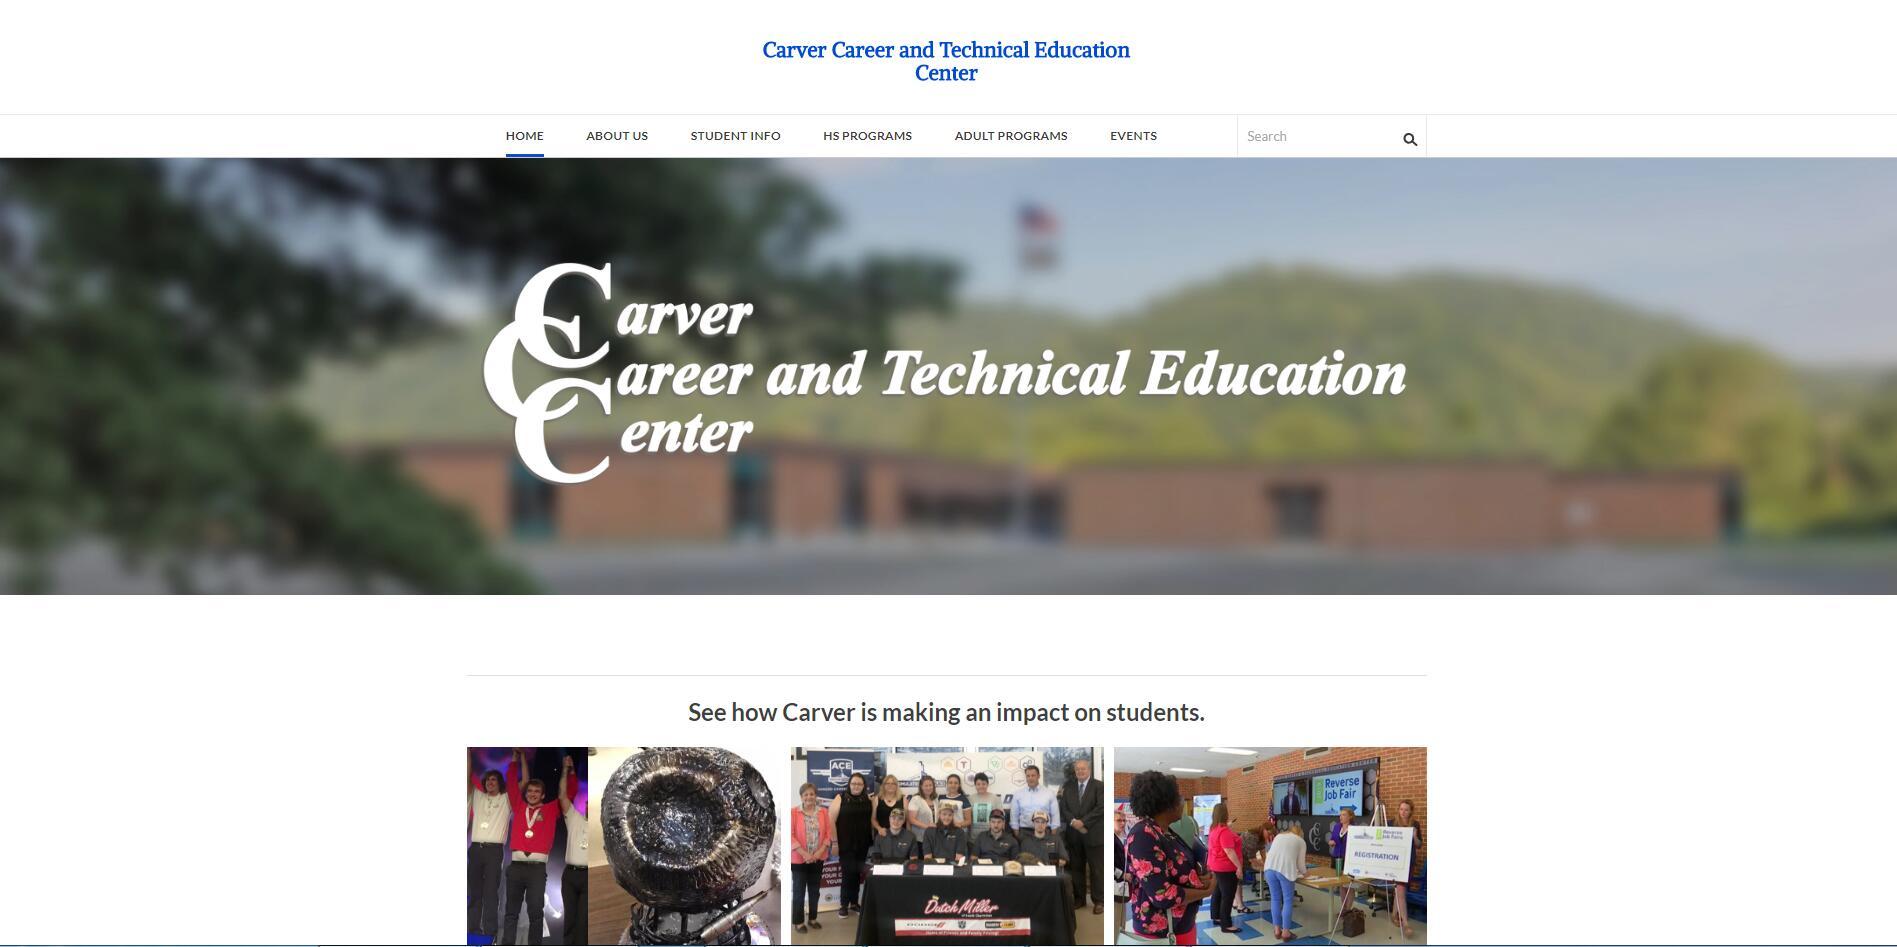 Carver Career Center